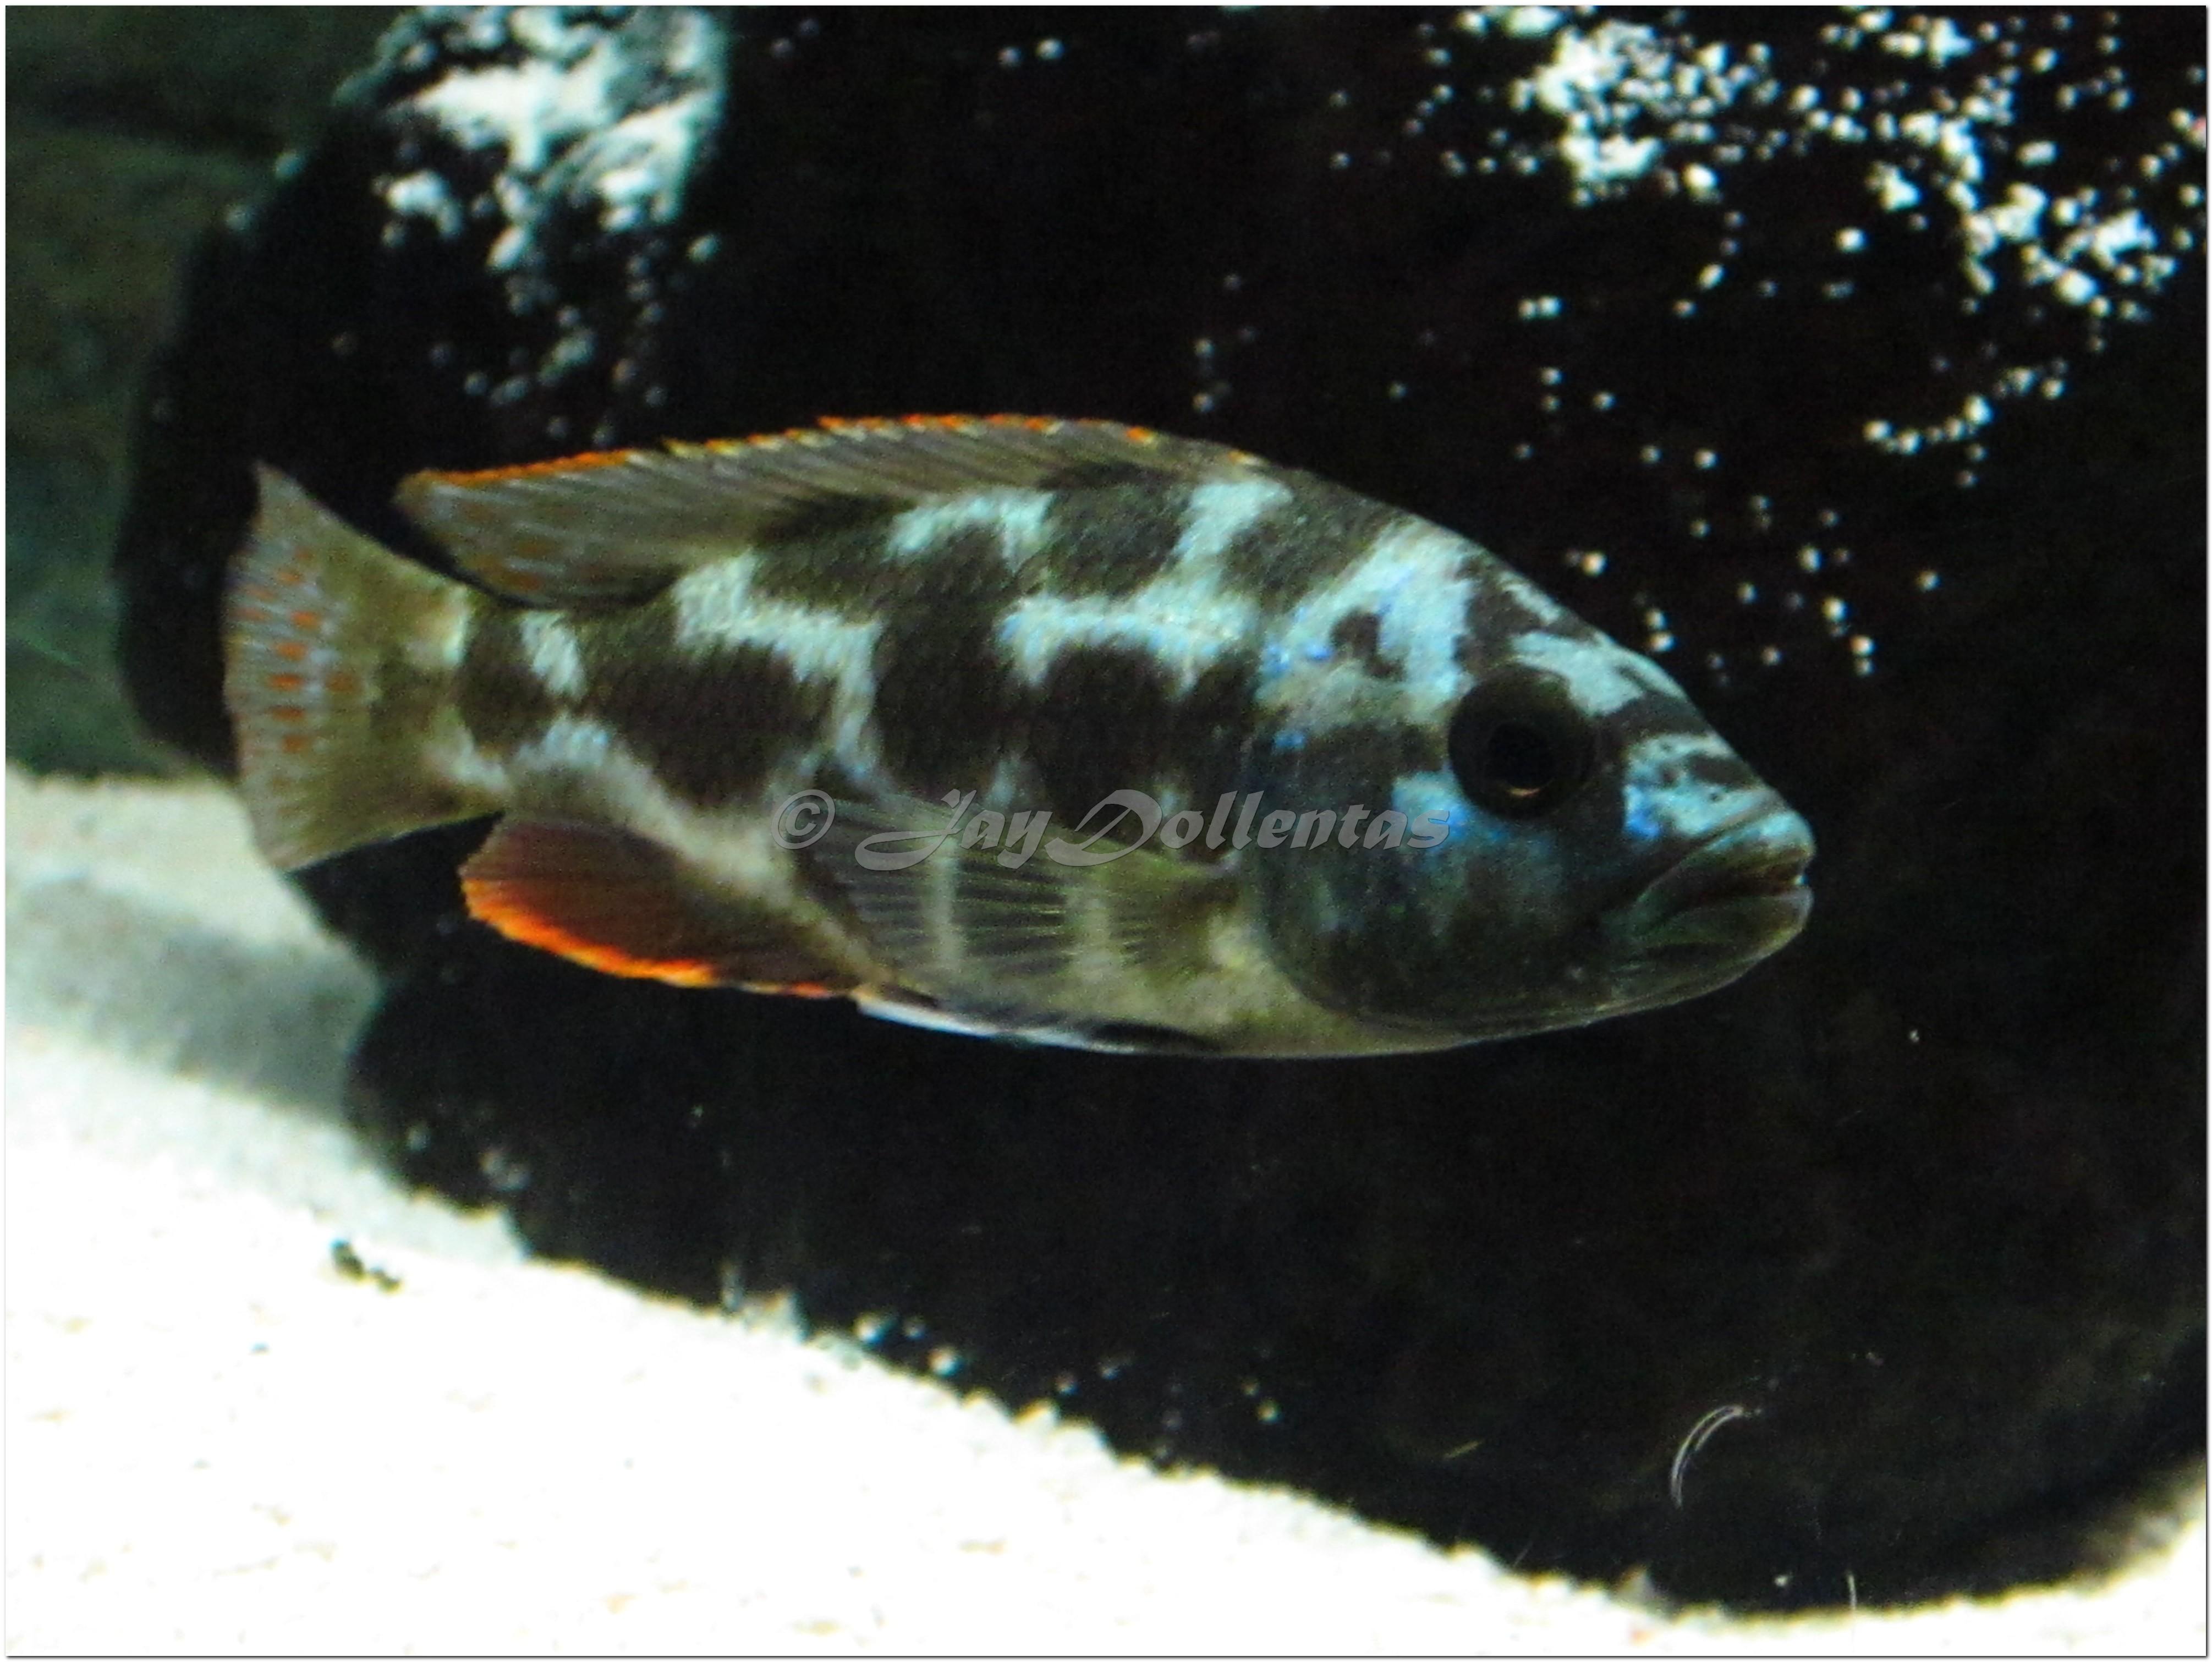 cichlids.com: Nimbochromis Livingstonii